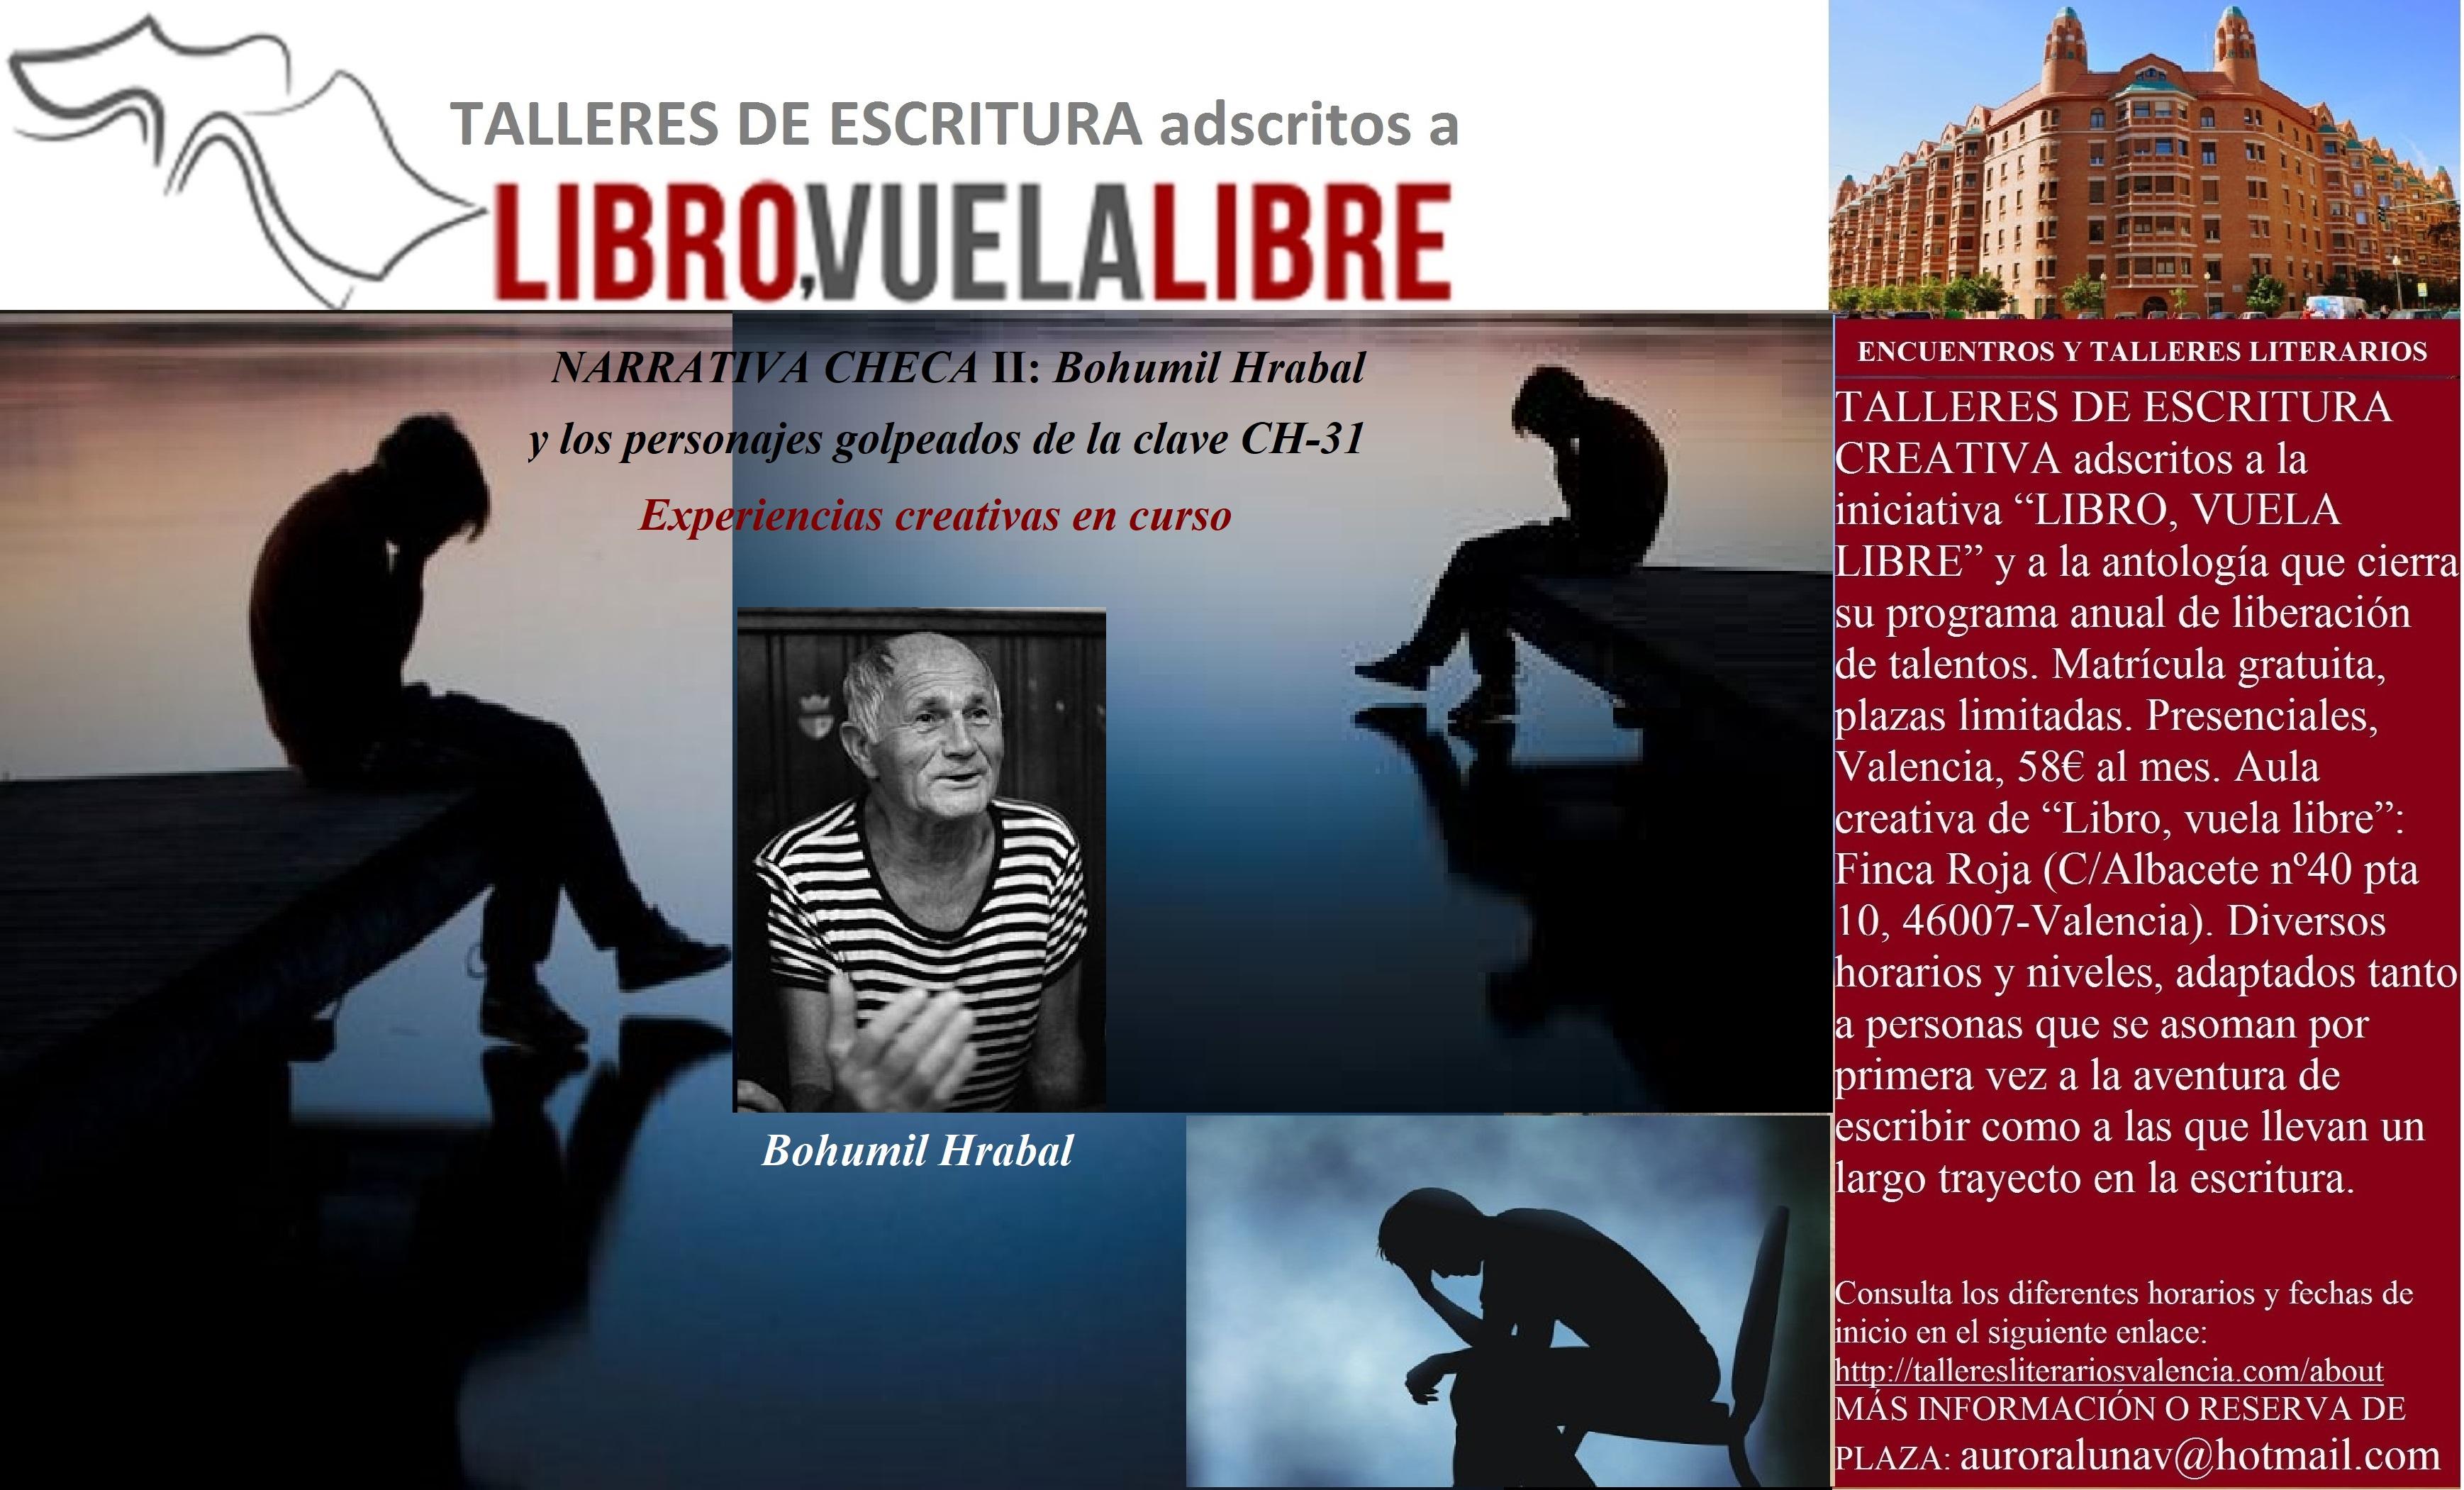 Cursos de escritura creativa en Valencia